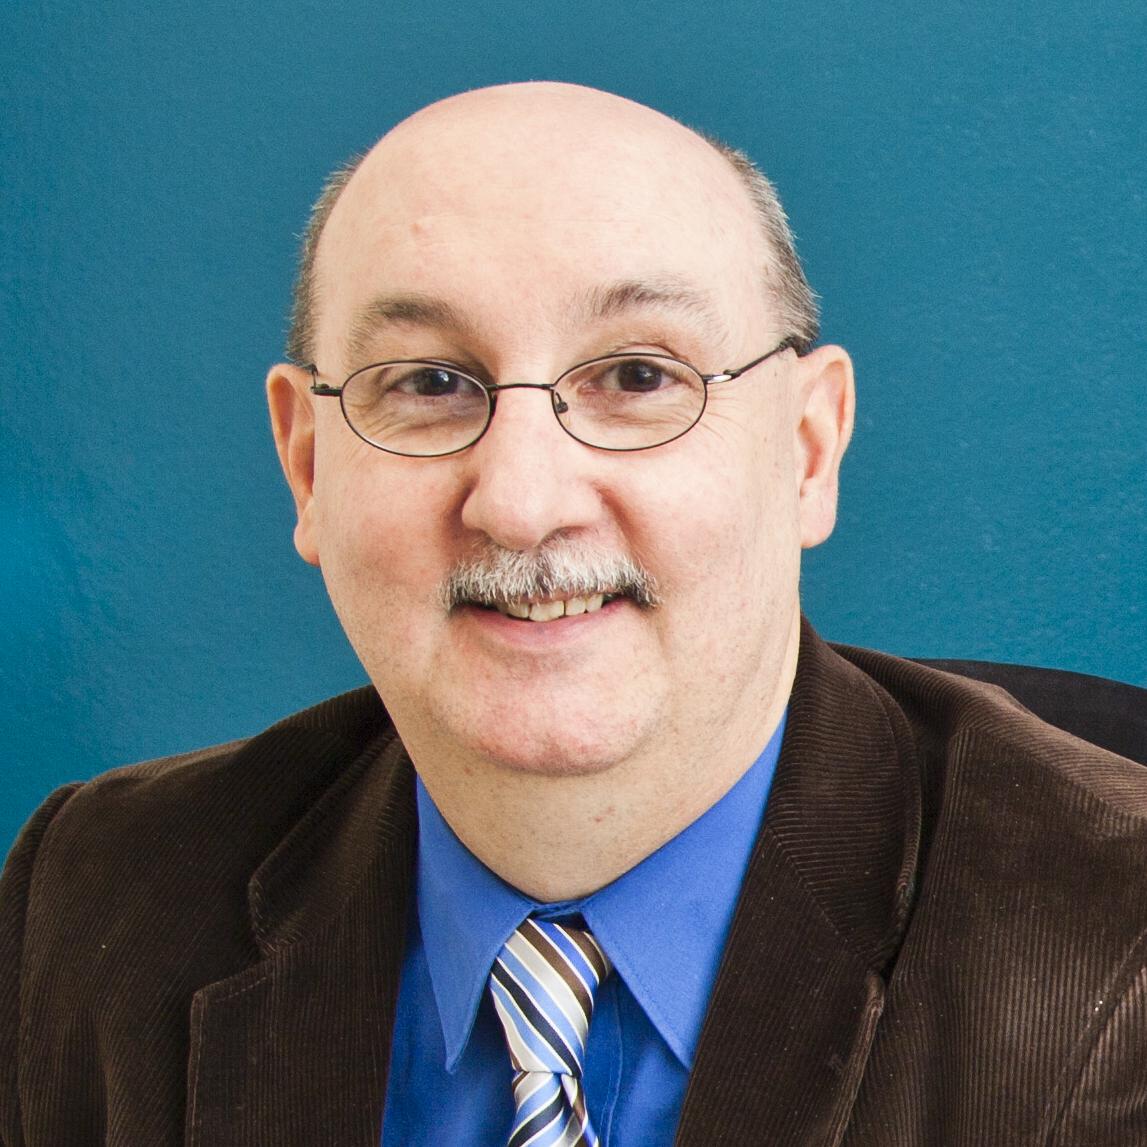 Portrait of Professor Timothy Clukey